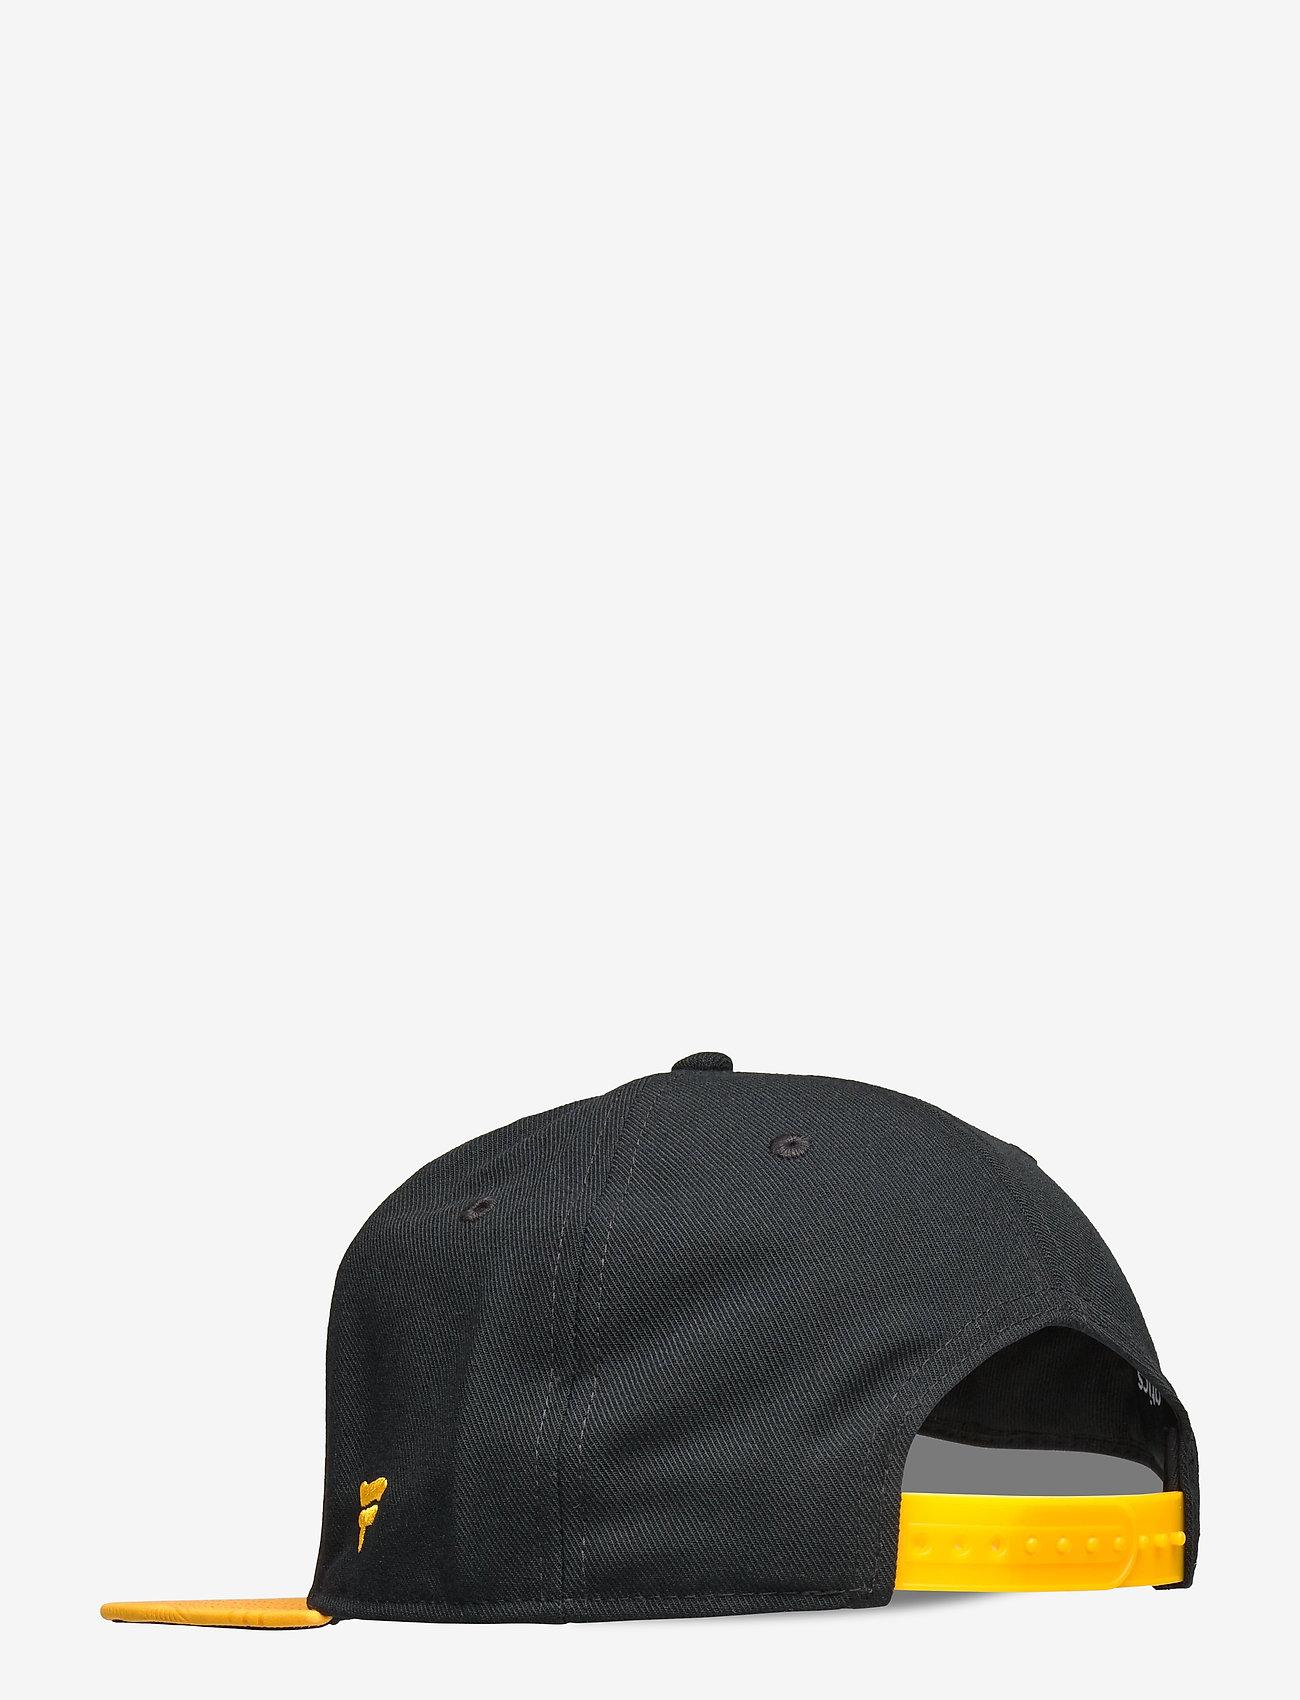 Fanatics - Pittsburgh Penguins Iconic Defender Snapback Cap - petten - black/yellow gold - 1